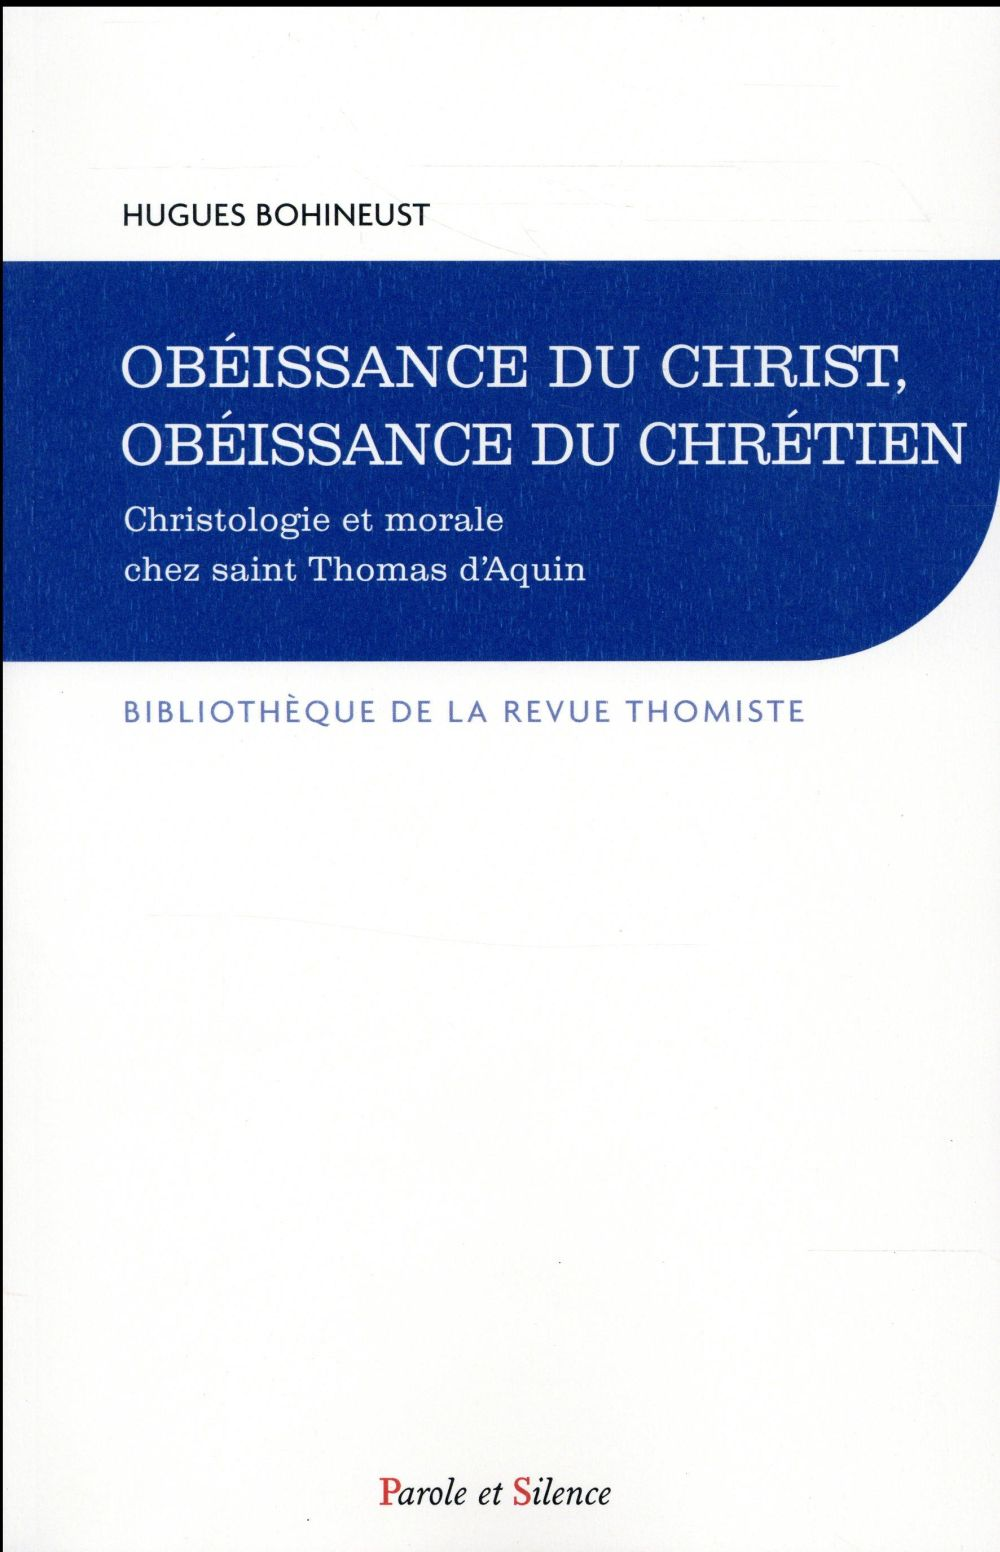 OBEISSANCE DU CHRIST, OBEISSANCE DU CHRETIEN